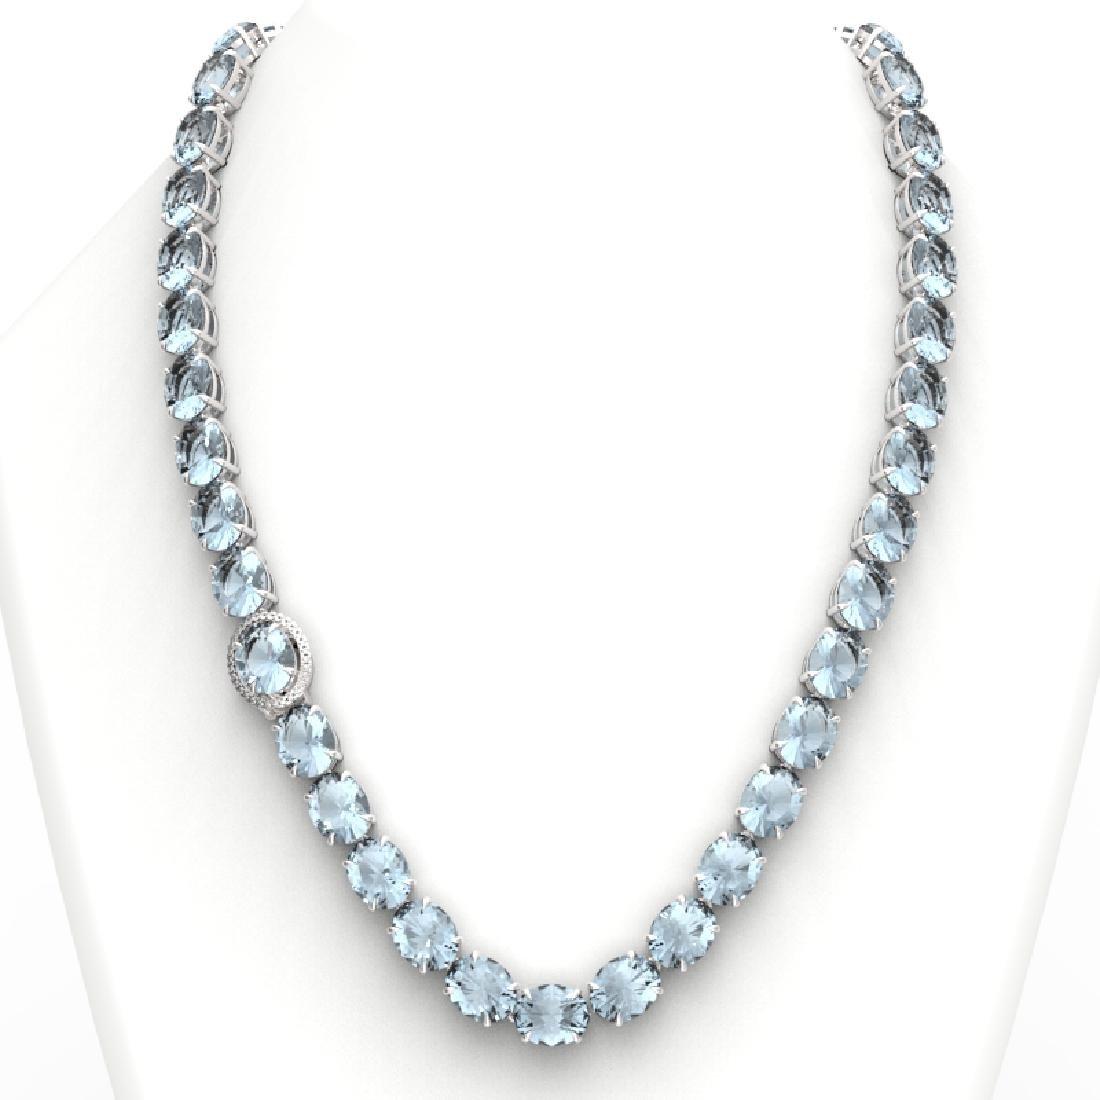 136 CTW Aquamarine & VS/SI Diamond Necklace 14K White - 3